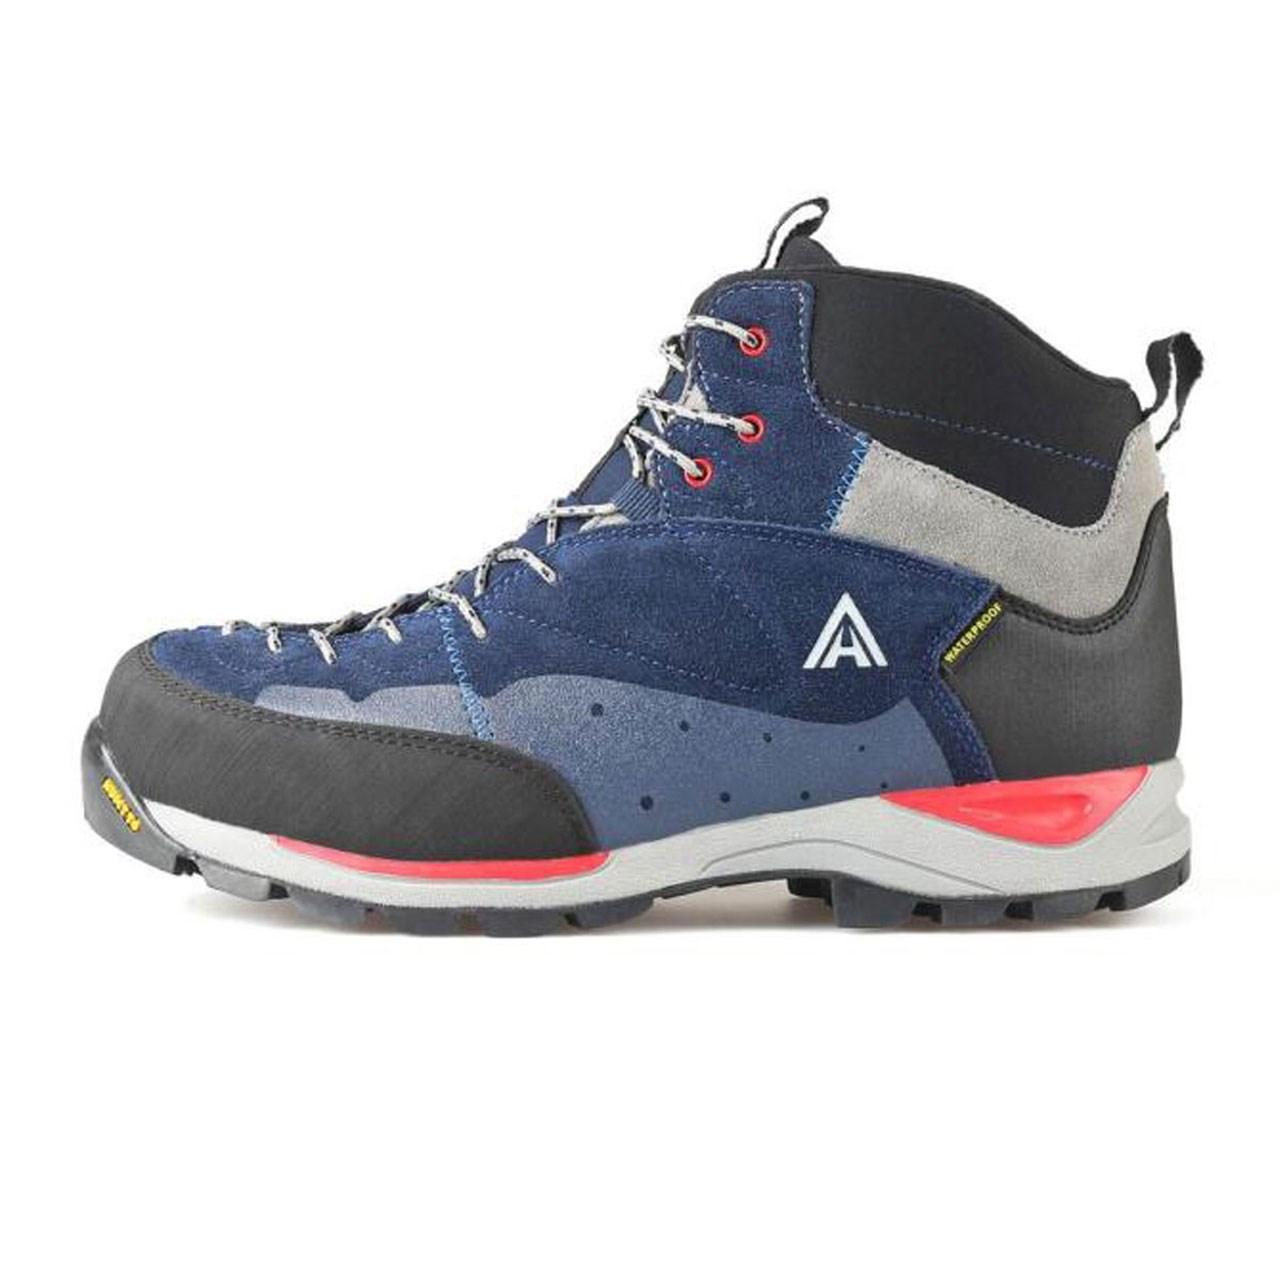 قیمت کفش کوهنوردی هامتو مدل 1-3588